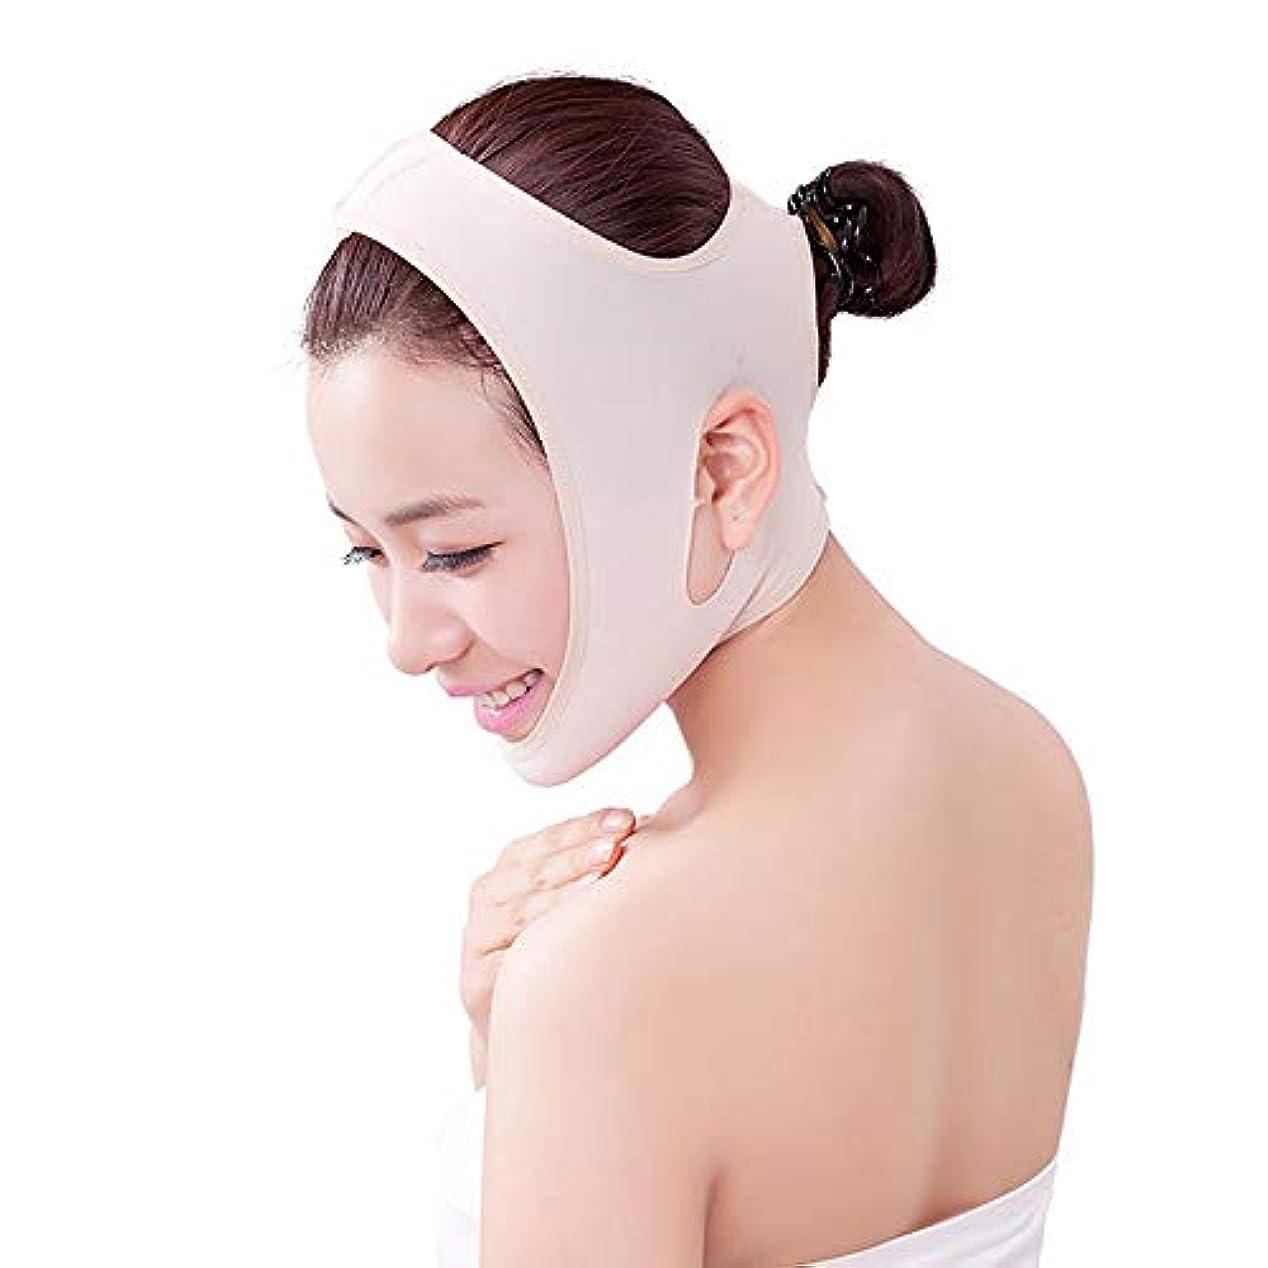 Jia Jia- 顔の持ち上がる痩身ベルト - アンチエイジングリンクルフェイスマスクベルトあなたの顔のためのすばらしい試し二重あごの試し 顔面包帯 (サイズ さいず : M)